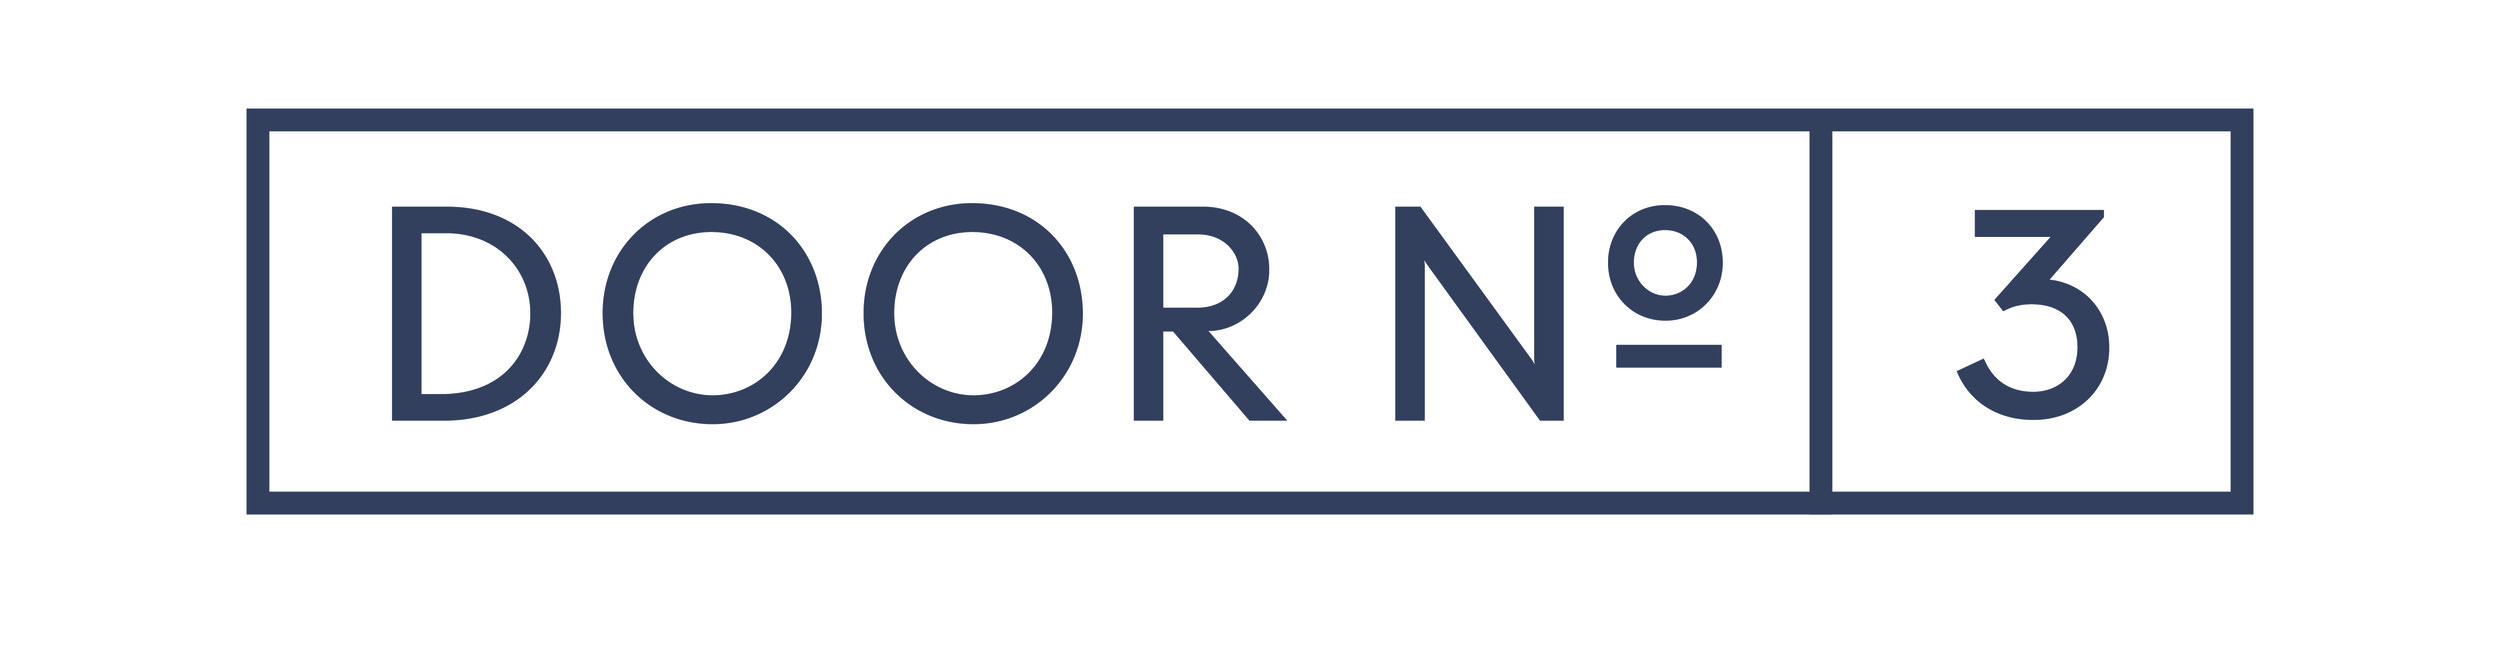 DoorNo3-Final-Logo-PANTONE-5395-01-01.jpg